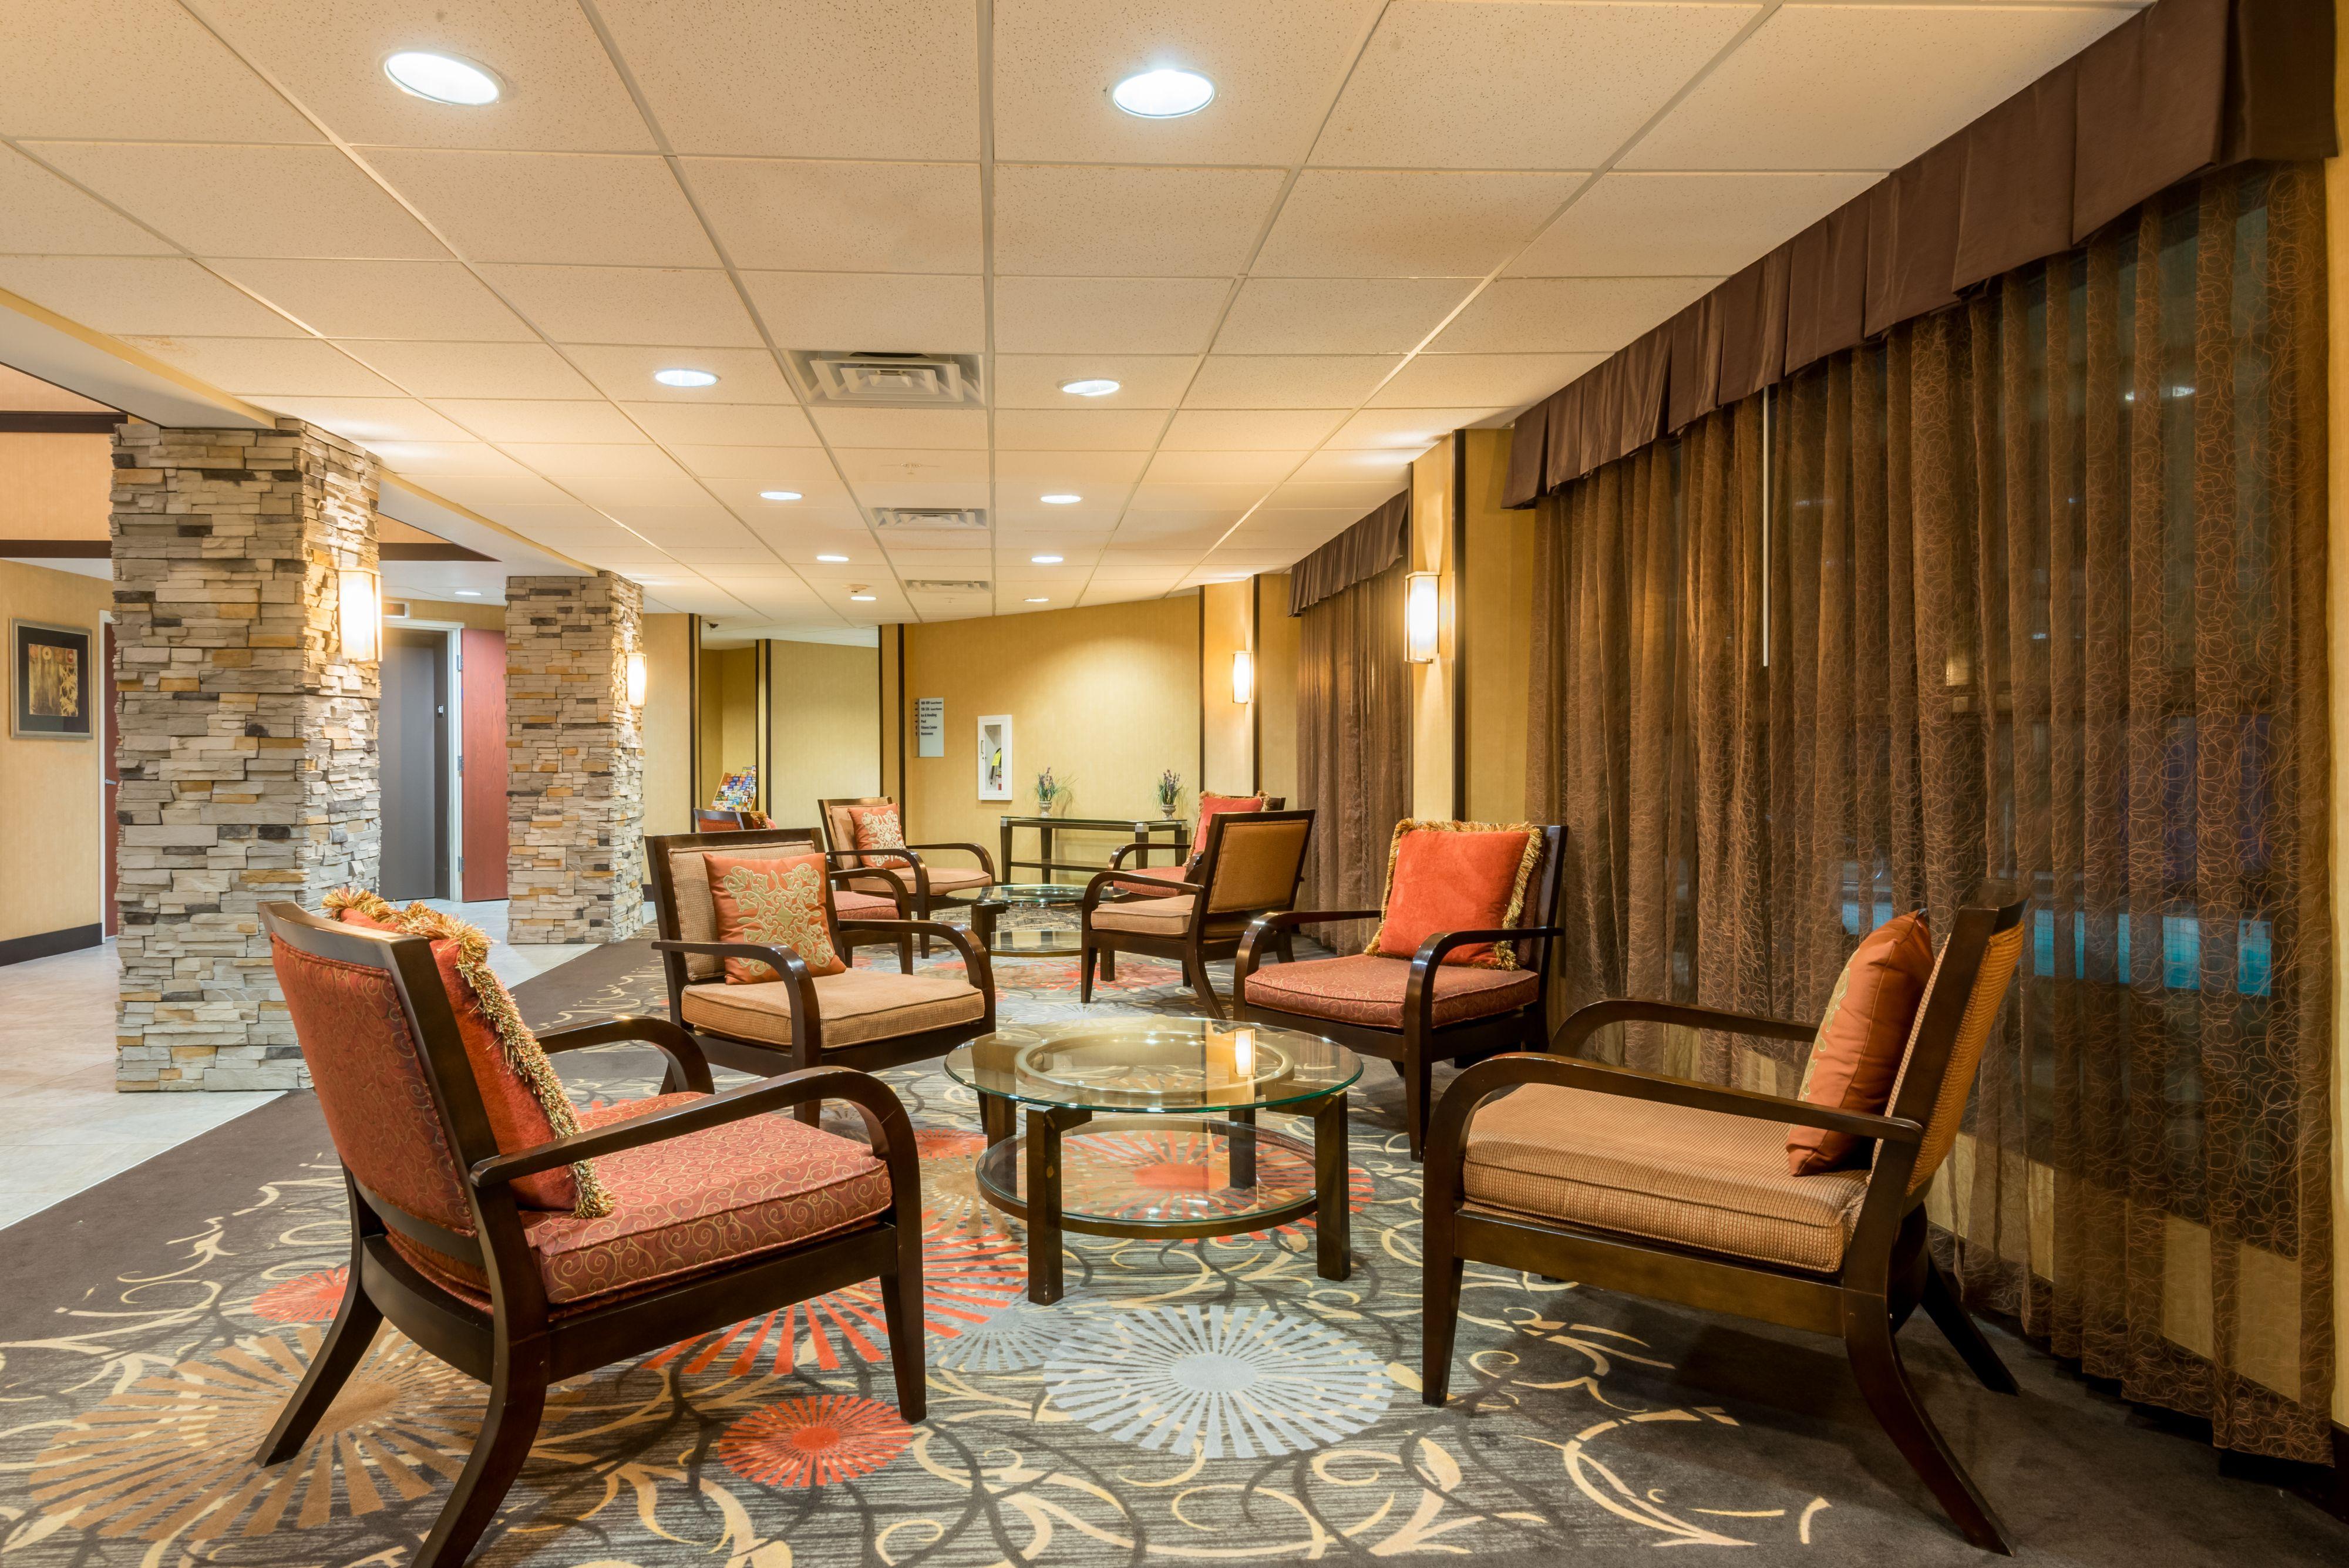 Comfort Inn Evansville East.Comfort Inn East Reviews Photos Rates ...